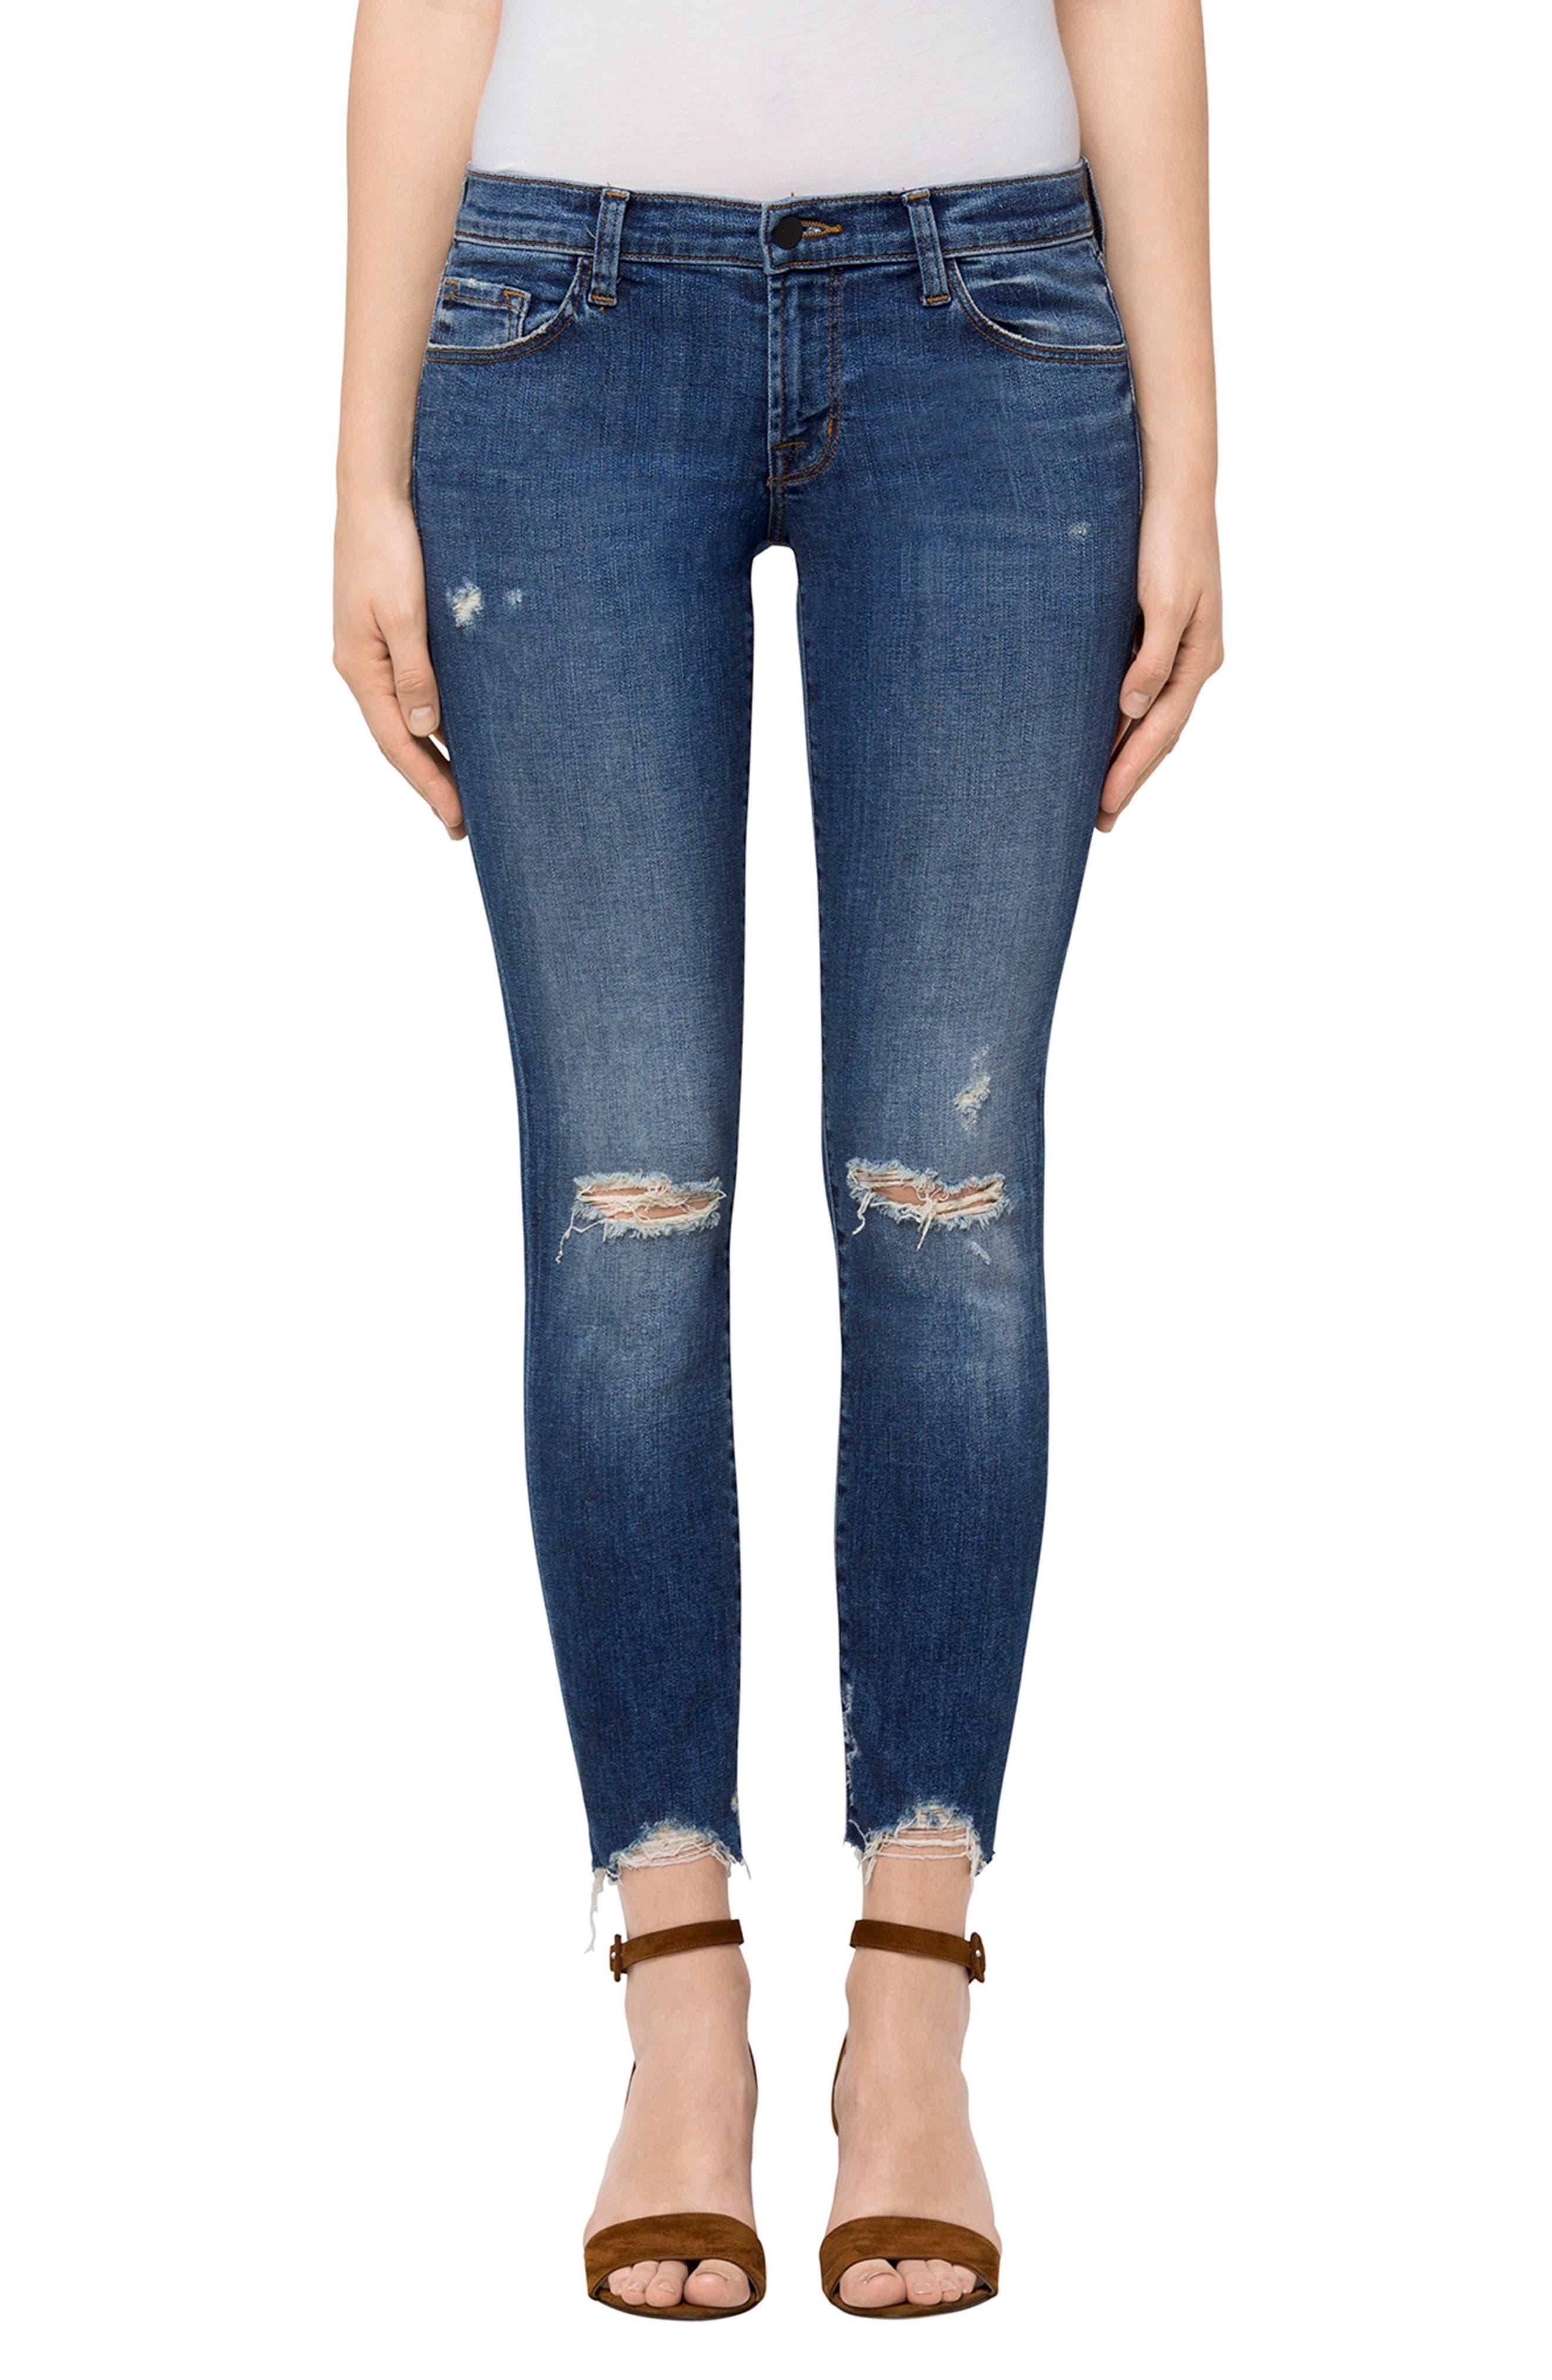 Alternate Image 1 Selected - J Brand 9326 Low Rise Crop Skinny Jeans (Revoke Destruct)